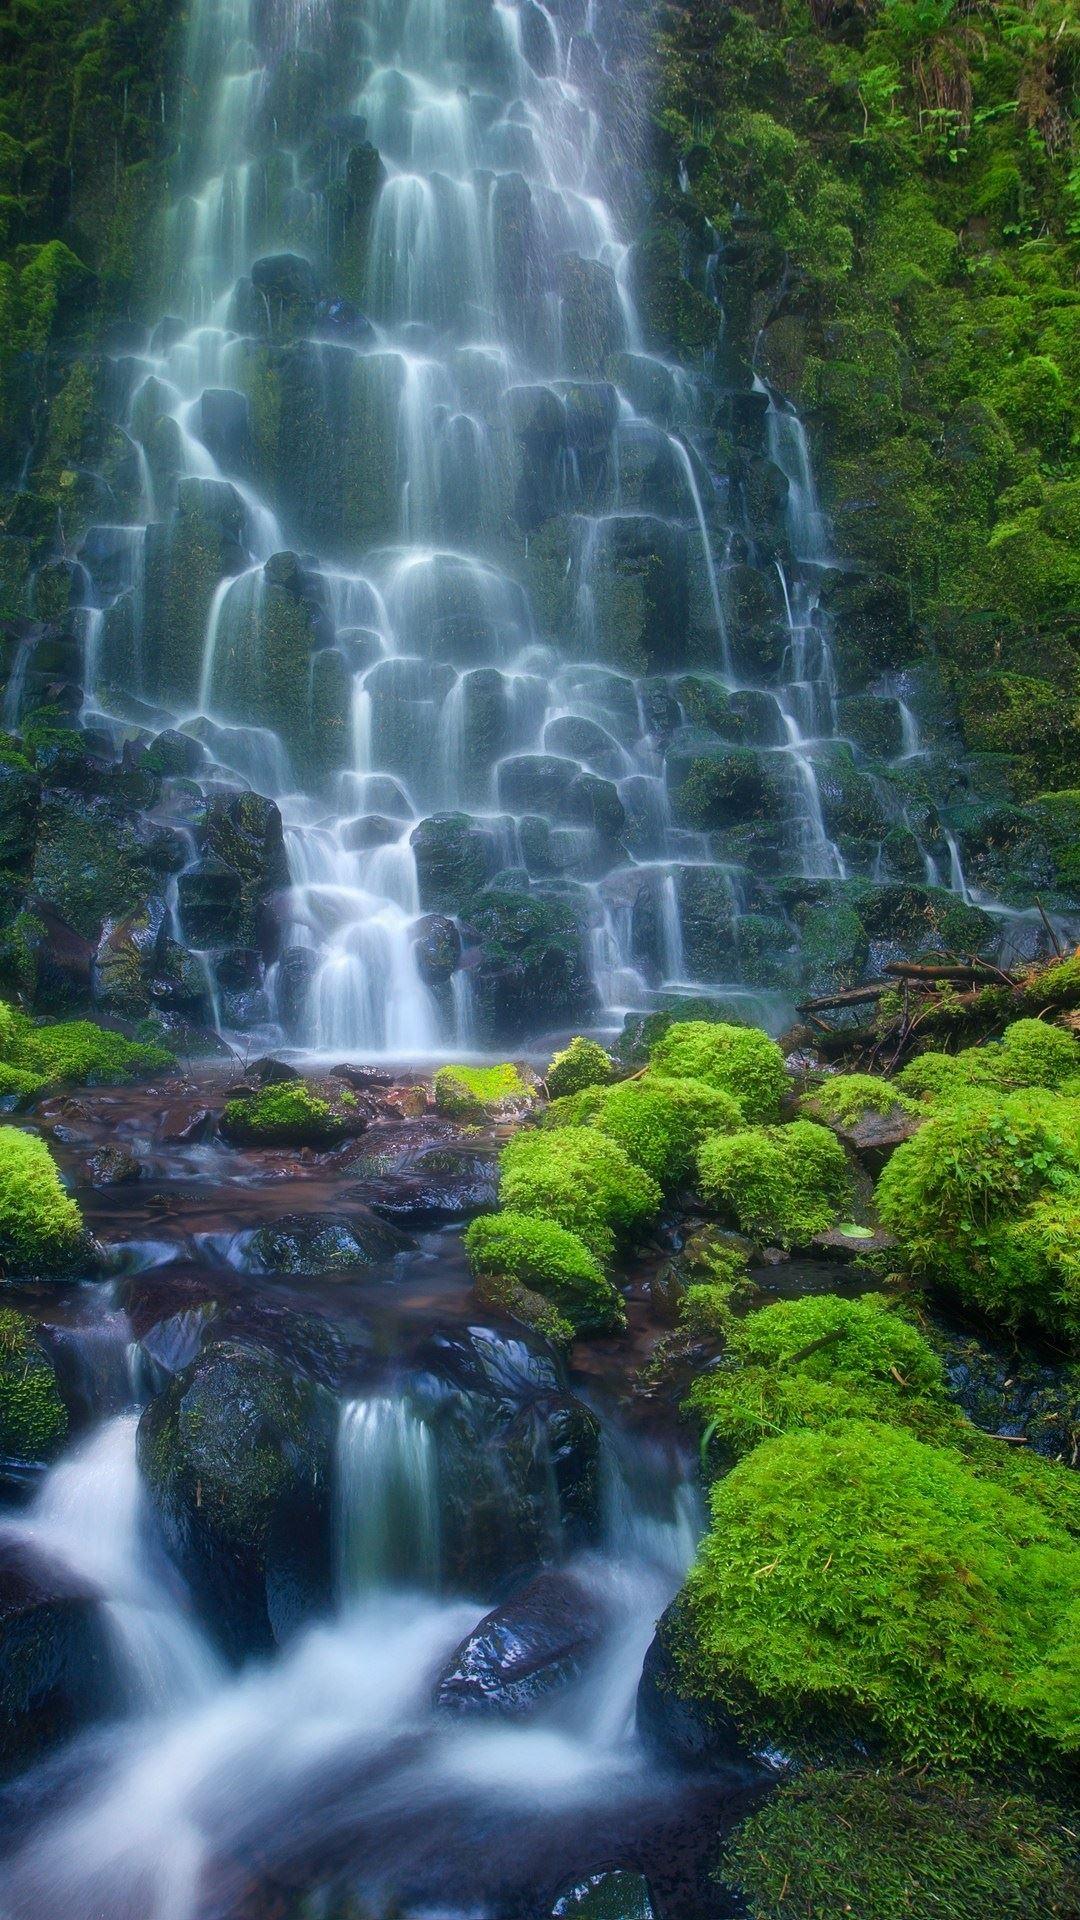 Waterfall Images Hd Download 1080x1920 Download Hd Wallpaper Wallpapertip